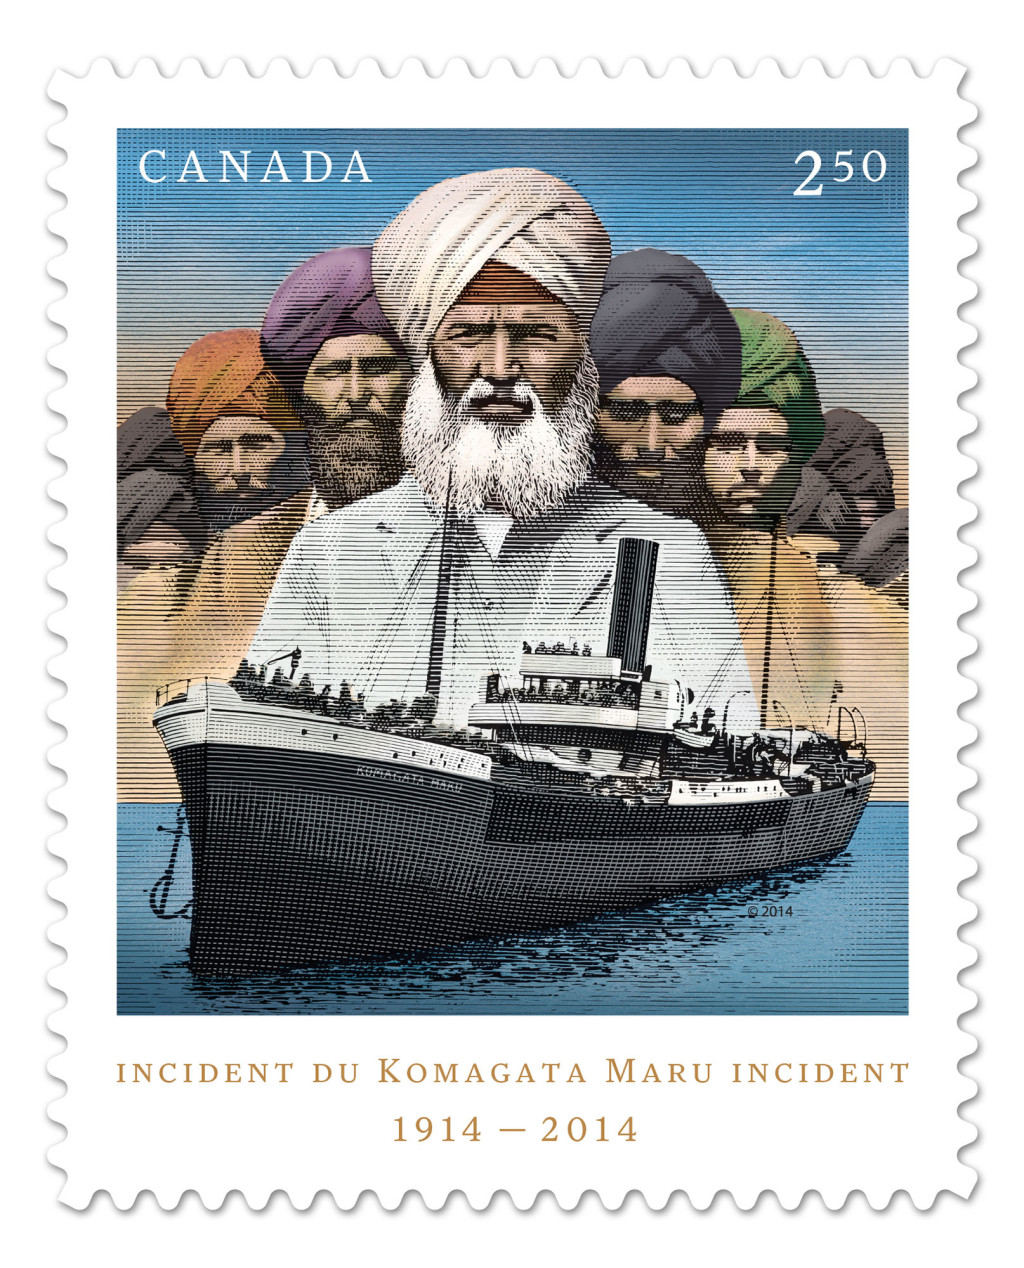 CANADA POST - 100th-year anniversary - Komagata Maru incident